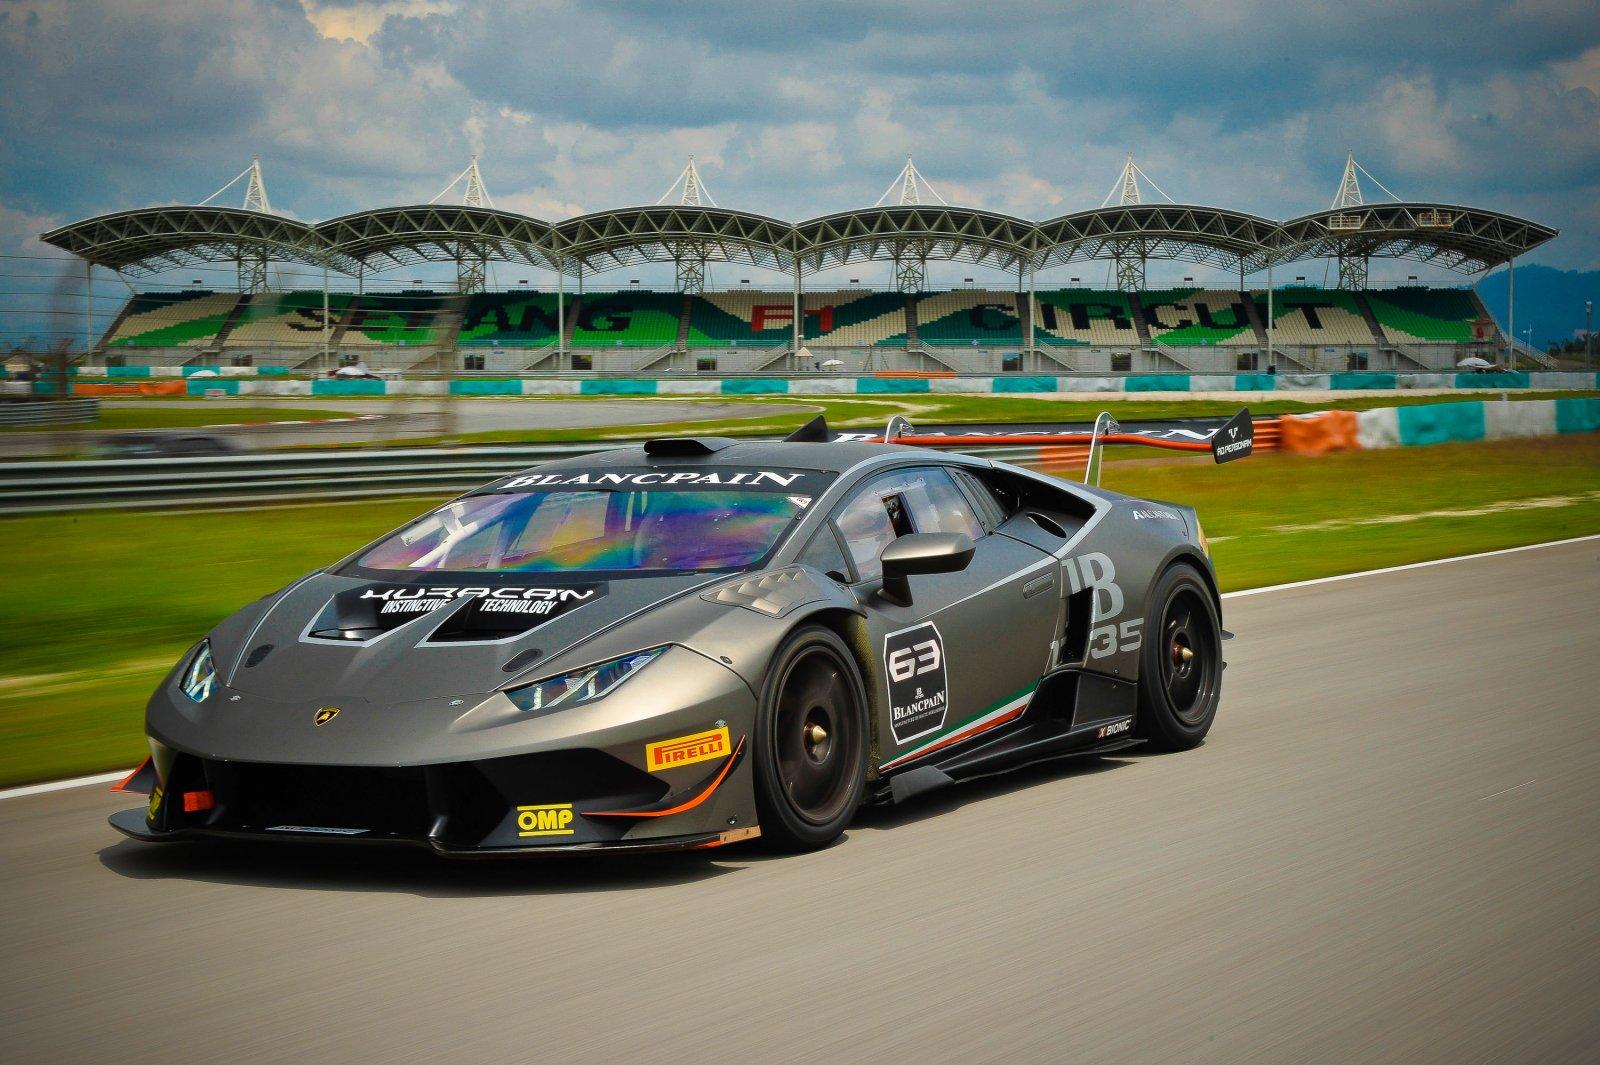 Lamborghini Blancpain Super Trofeo again joins forces with Blancpain Endurance Series